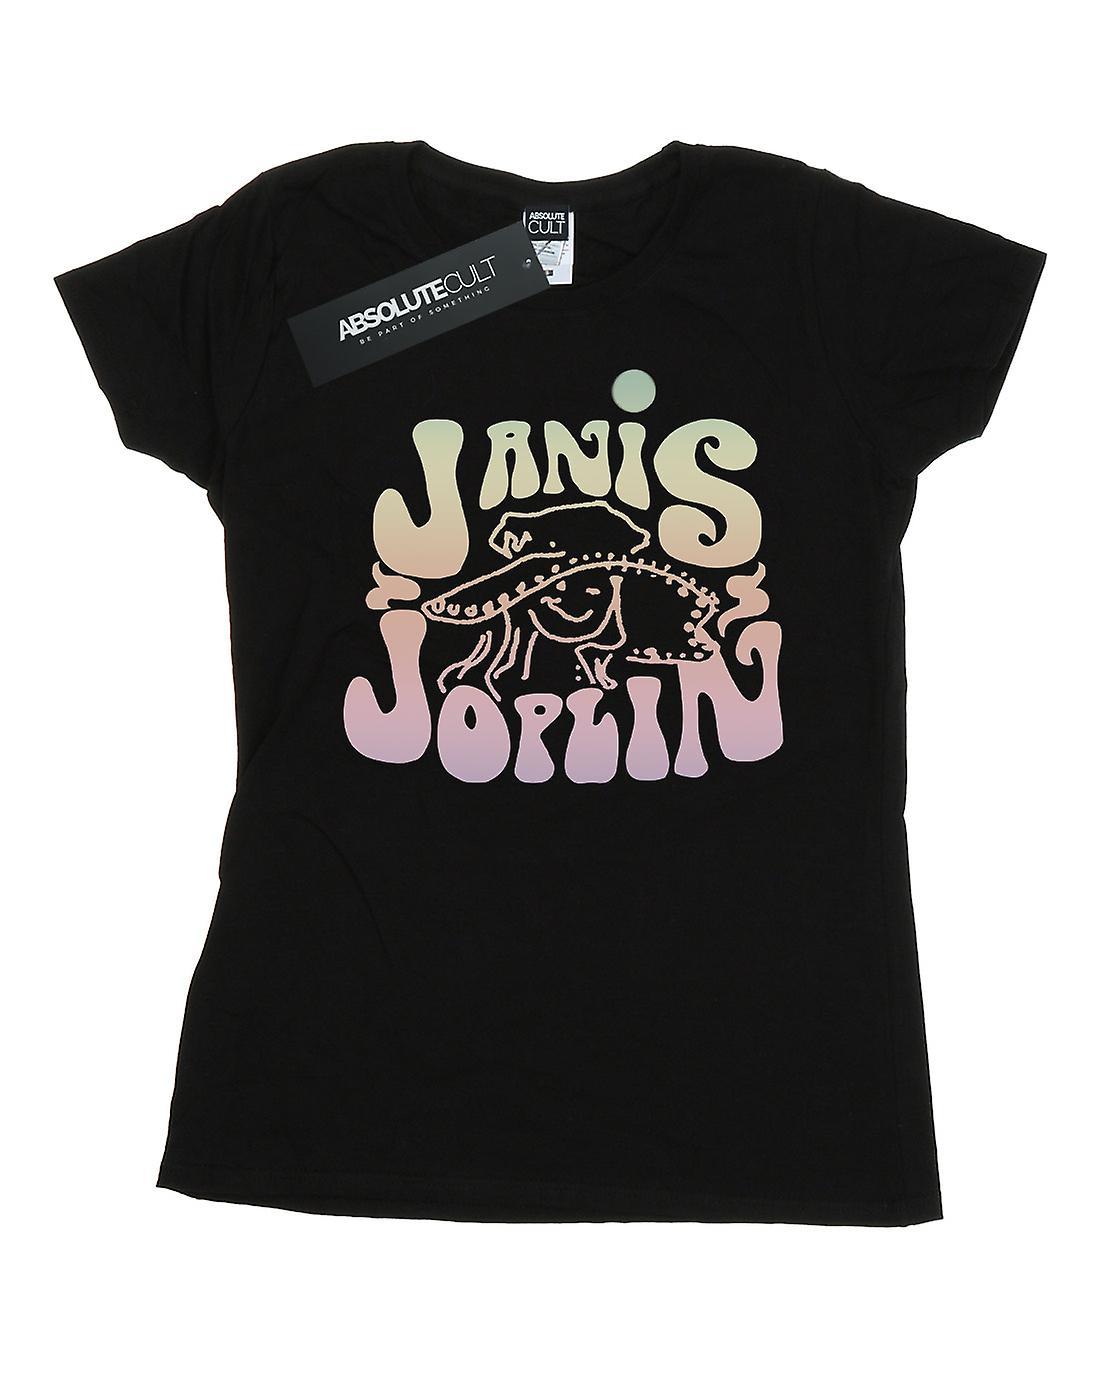 Janis Joplin Women's Pastel Logo T-Shirt